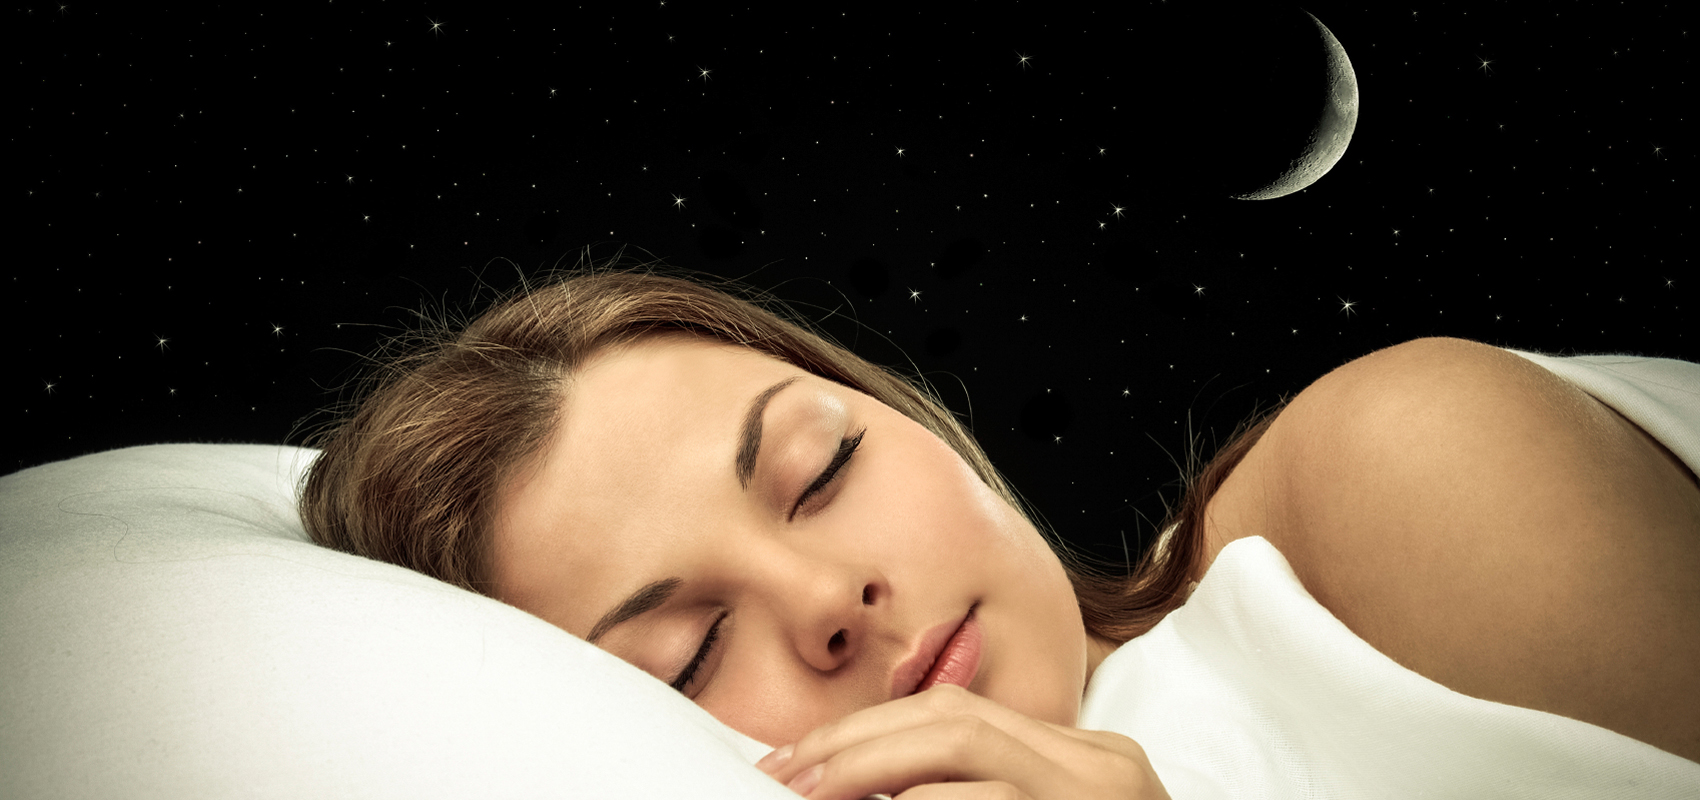 women-sleeping-in-night-vision-free-hardcore-teen-perky-tit-porn